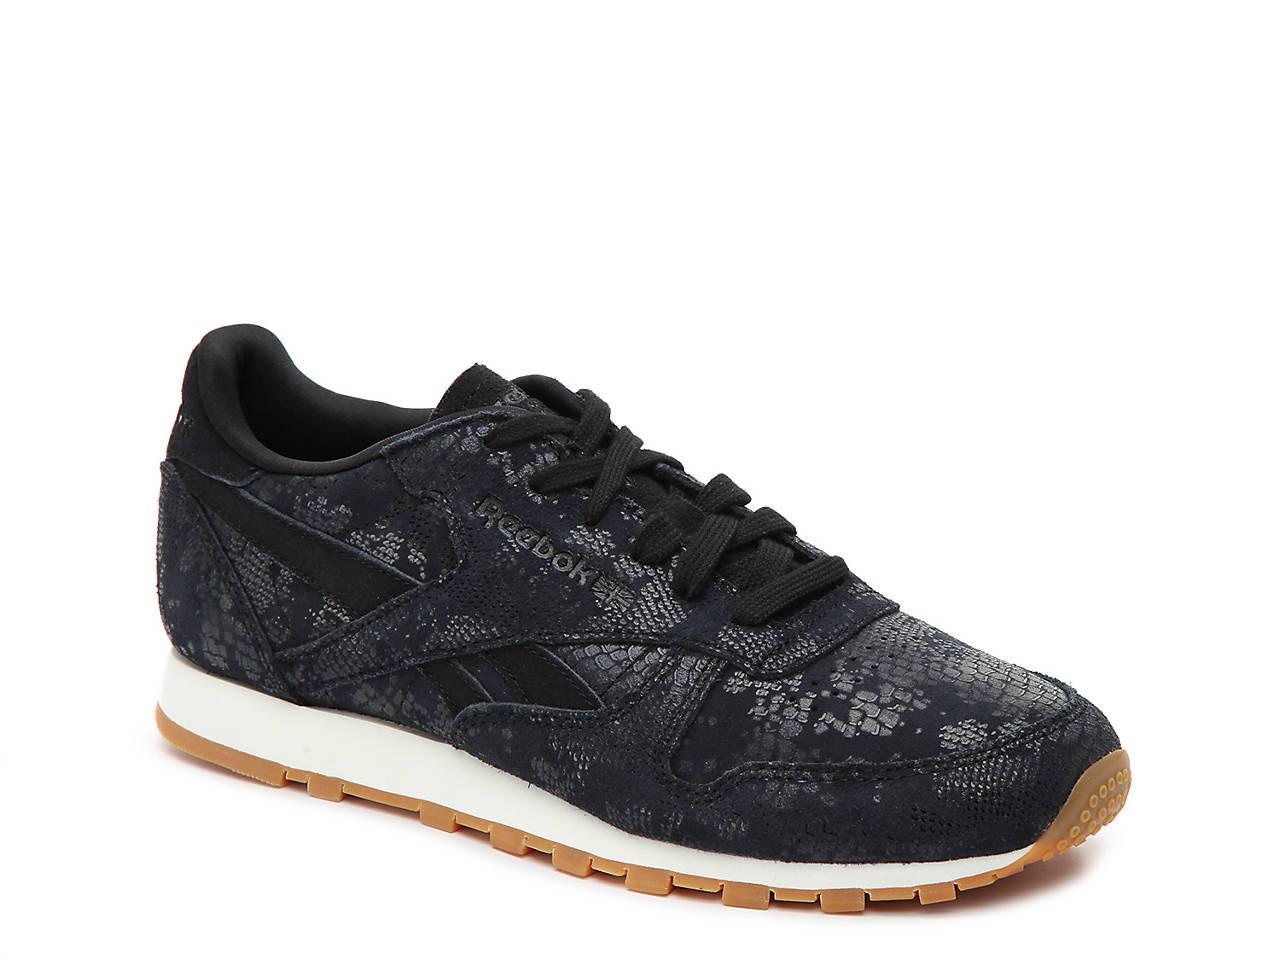 b18bc816fdde Reebok Classic Embossed Sneaker - Women s Women s Shoes